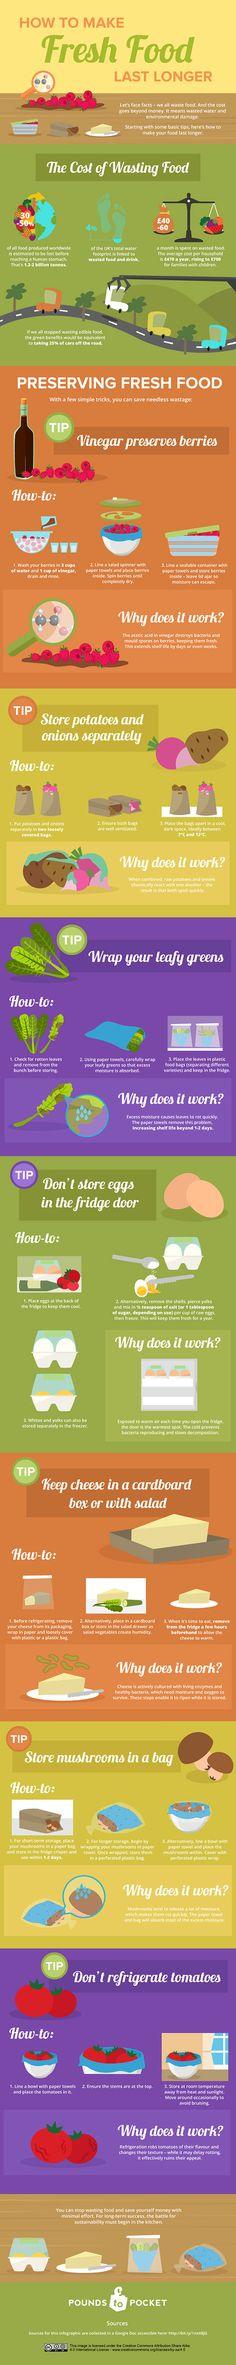 How to make food last longer!       Gloucestershire Resource Centre http://www.grcltd.org/scrapstore/